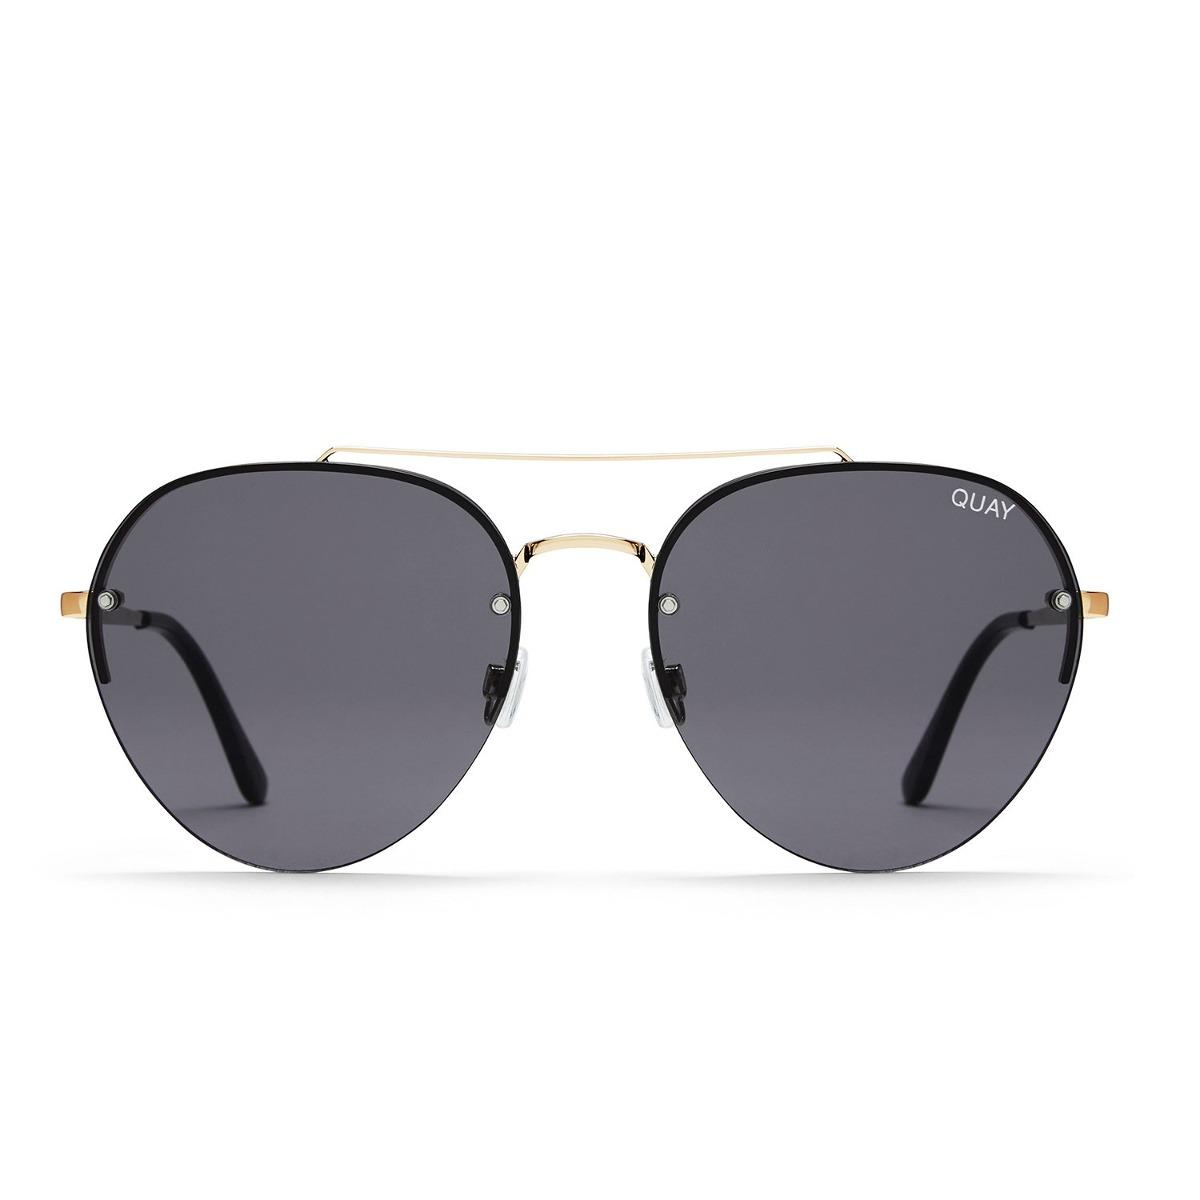 dbc2c44cb4 Gafas U Australia De Sol Mujer Somerset 137 Modern s Quay Para Av nOk0wP